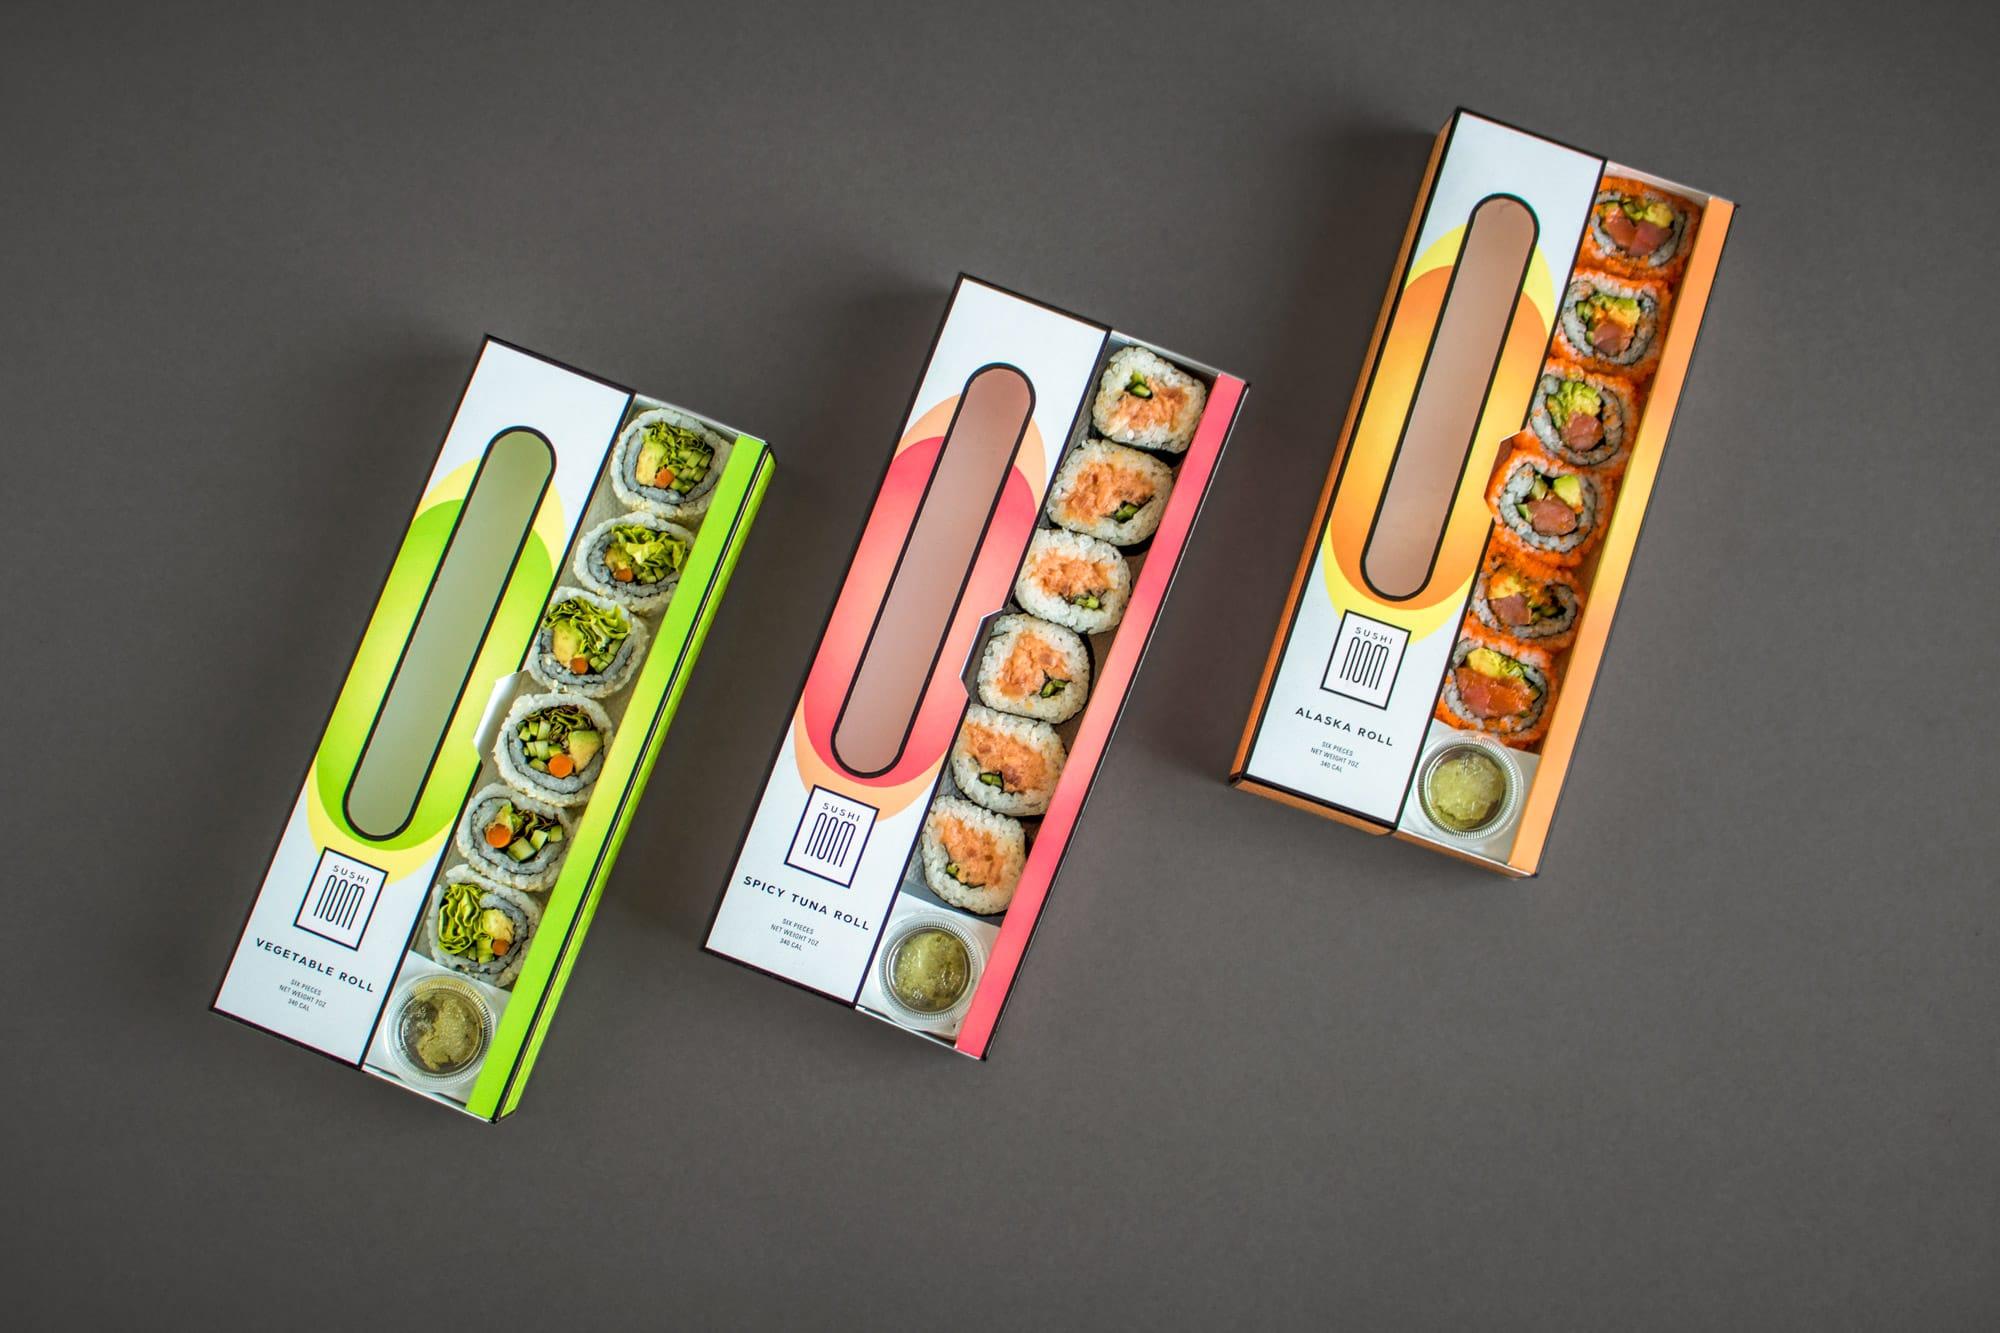 kevin-kwok-design-sushi-nom-2